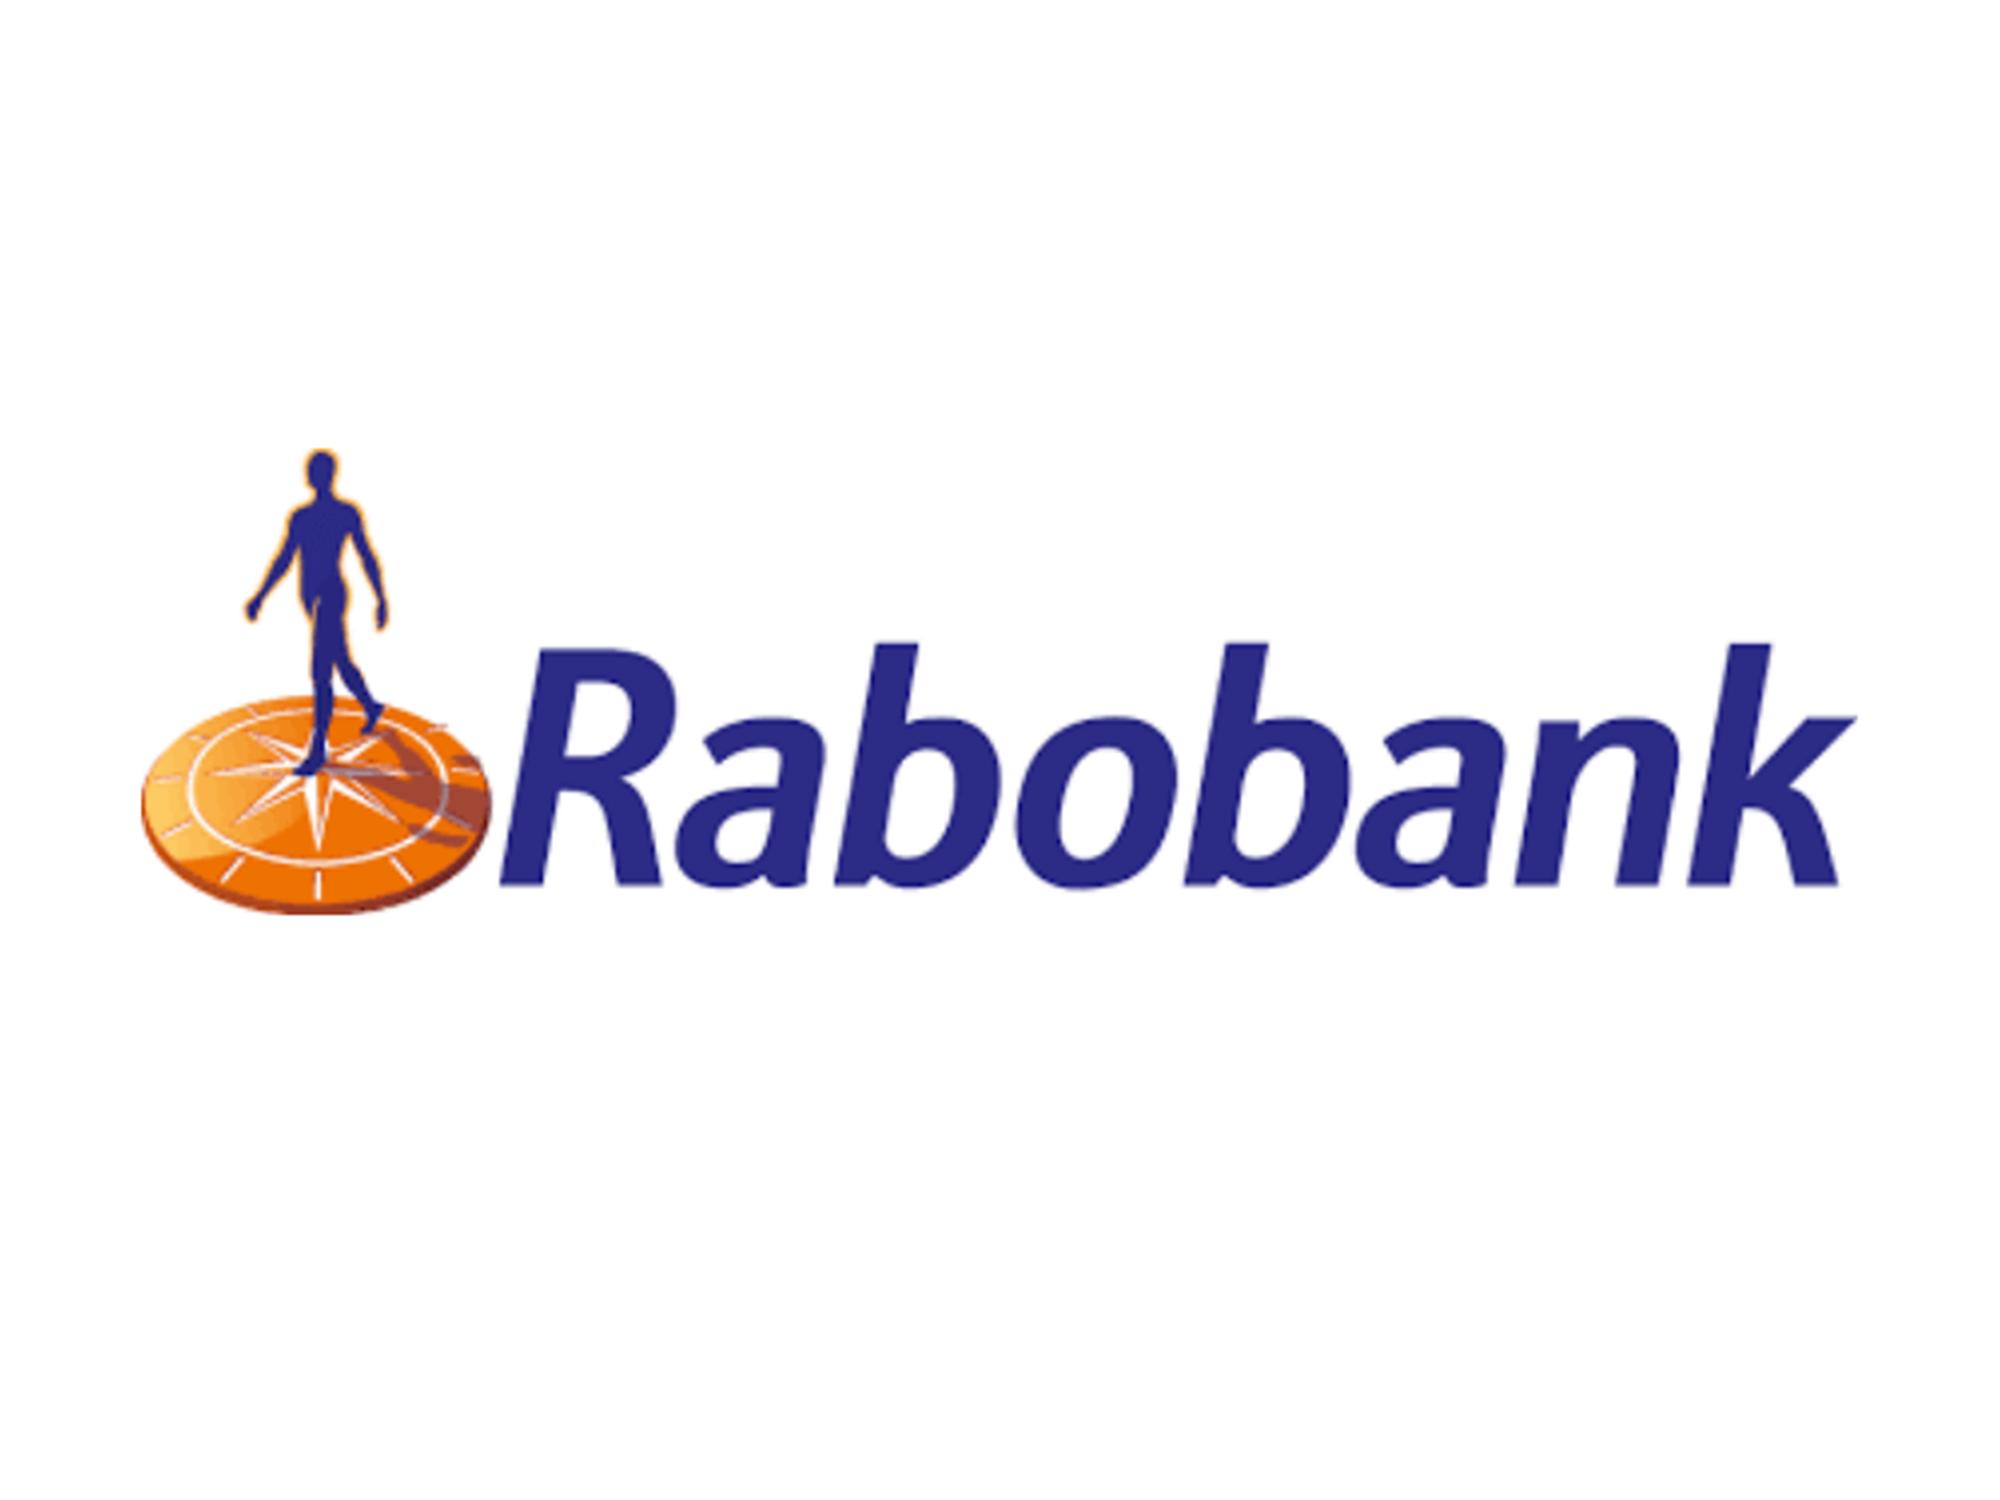 Logo Rabobank Foundation - Financiadores - Findepro